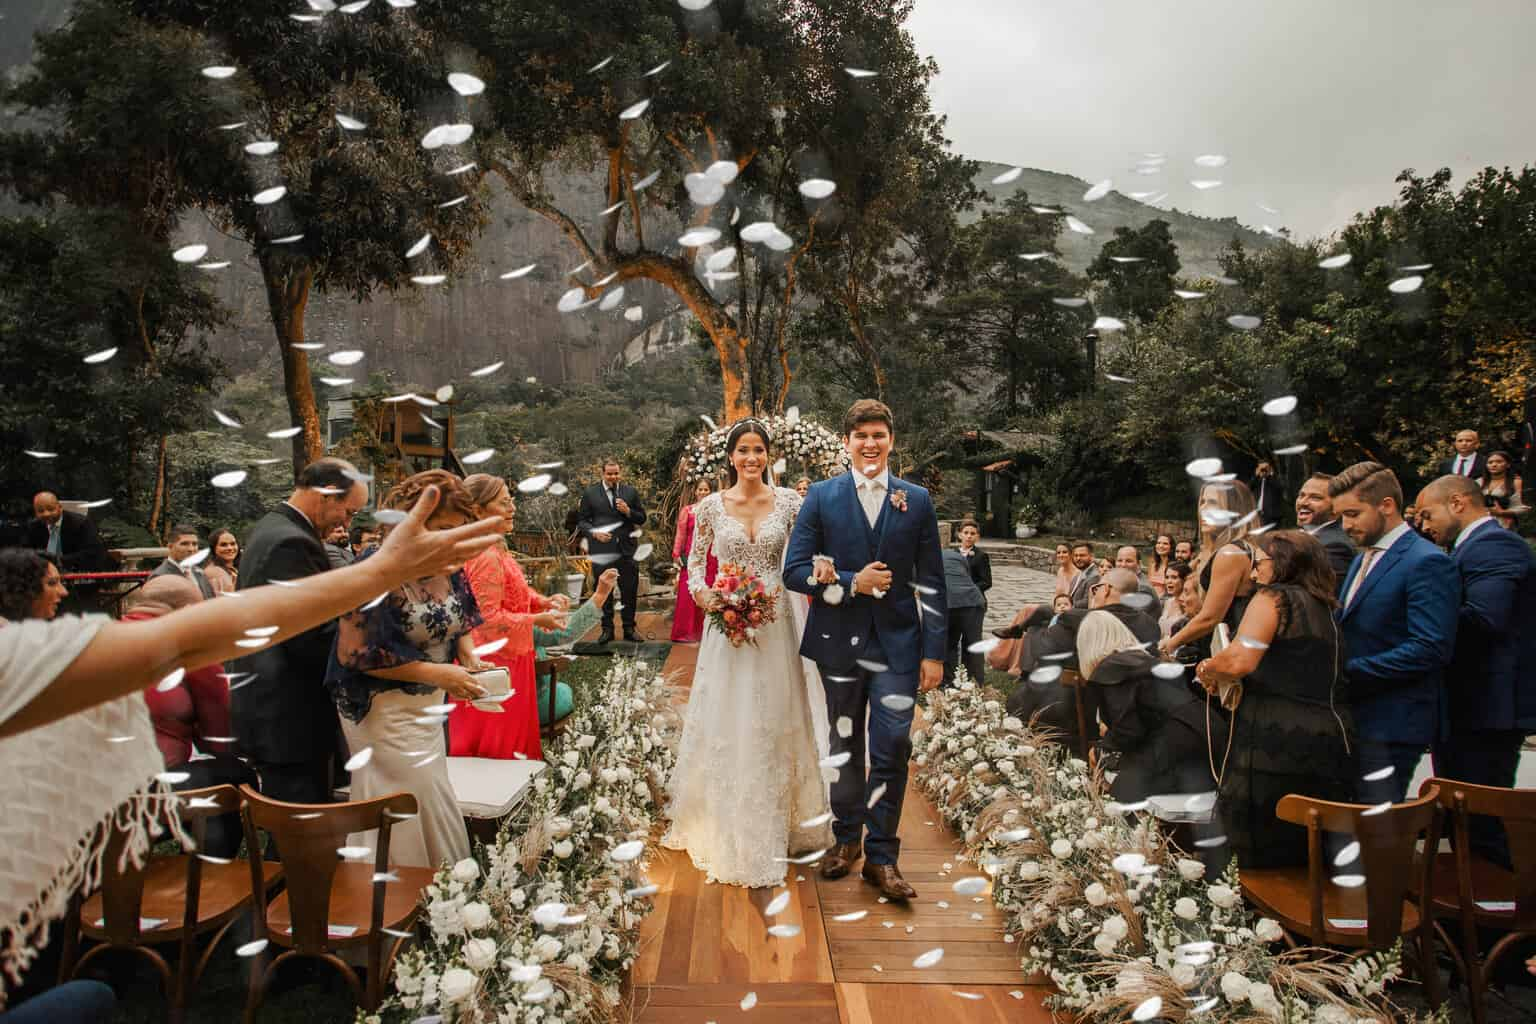 casamento-Beatriz-e-Joao-Fernando-cerimonia-ao-ar-livre-Itaipava-Locanda-Della-Mimosa-Thienny-Tammis174